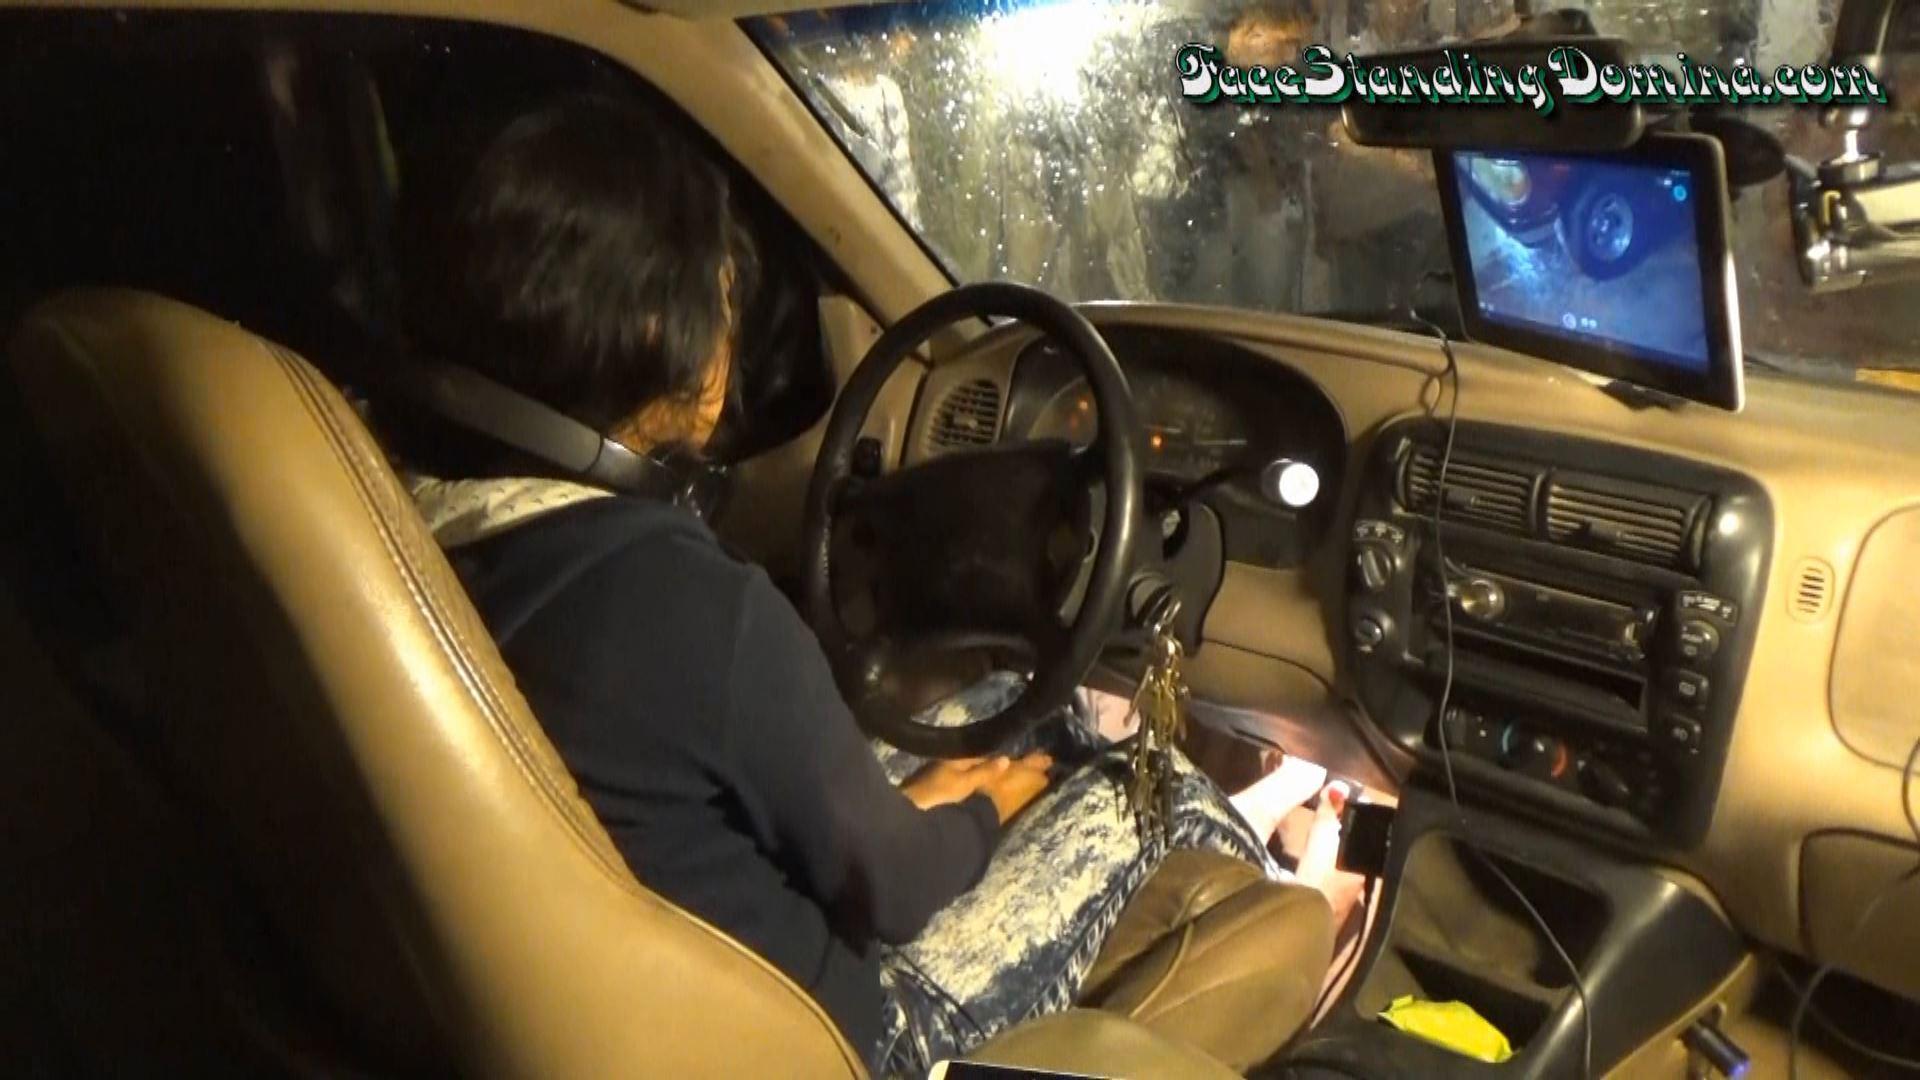 [SCAT-PRINCESS] Anita wheeling on his Hand from the Inside [FULL HD][1080p][WMV]